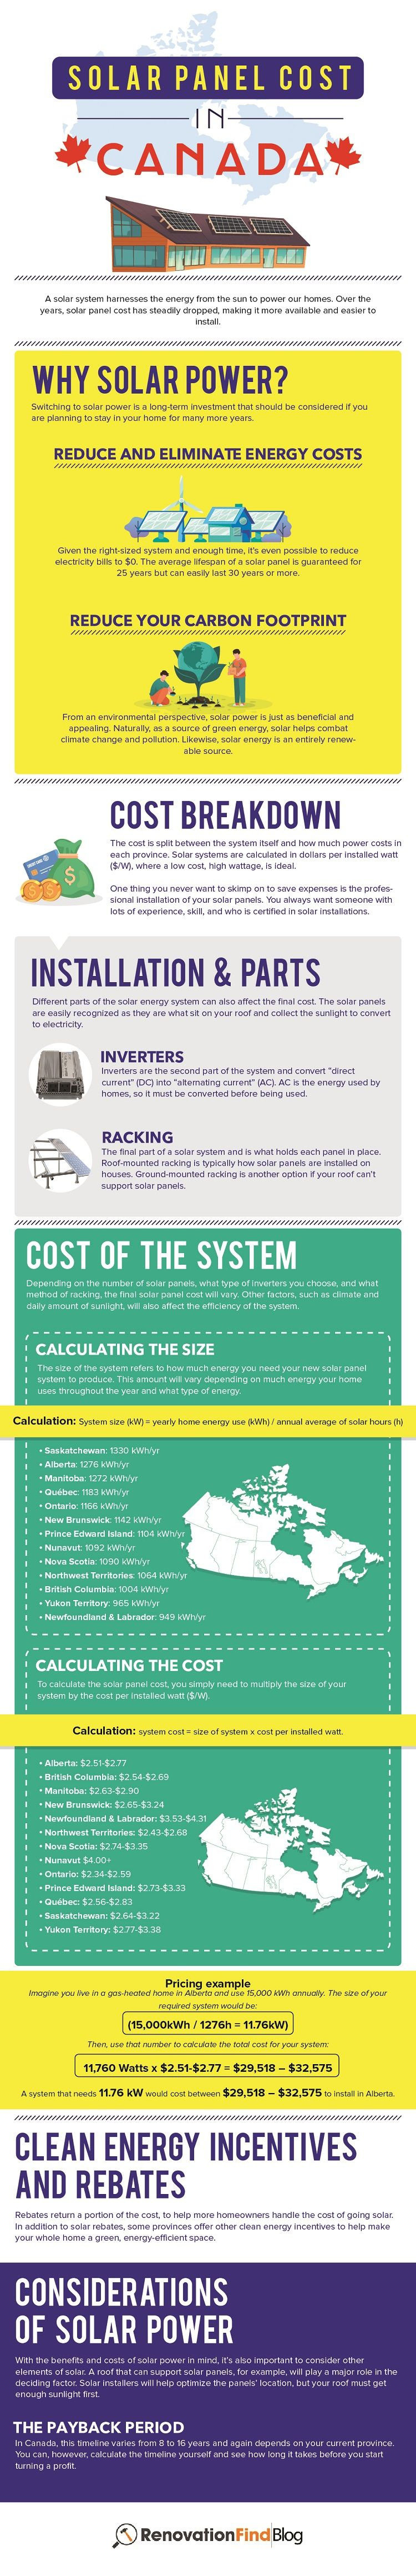 Solar Companies Vancouver In 2020 Solar Panel Cost Solar Companies Solar